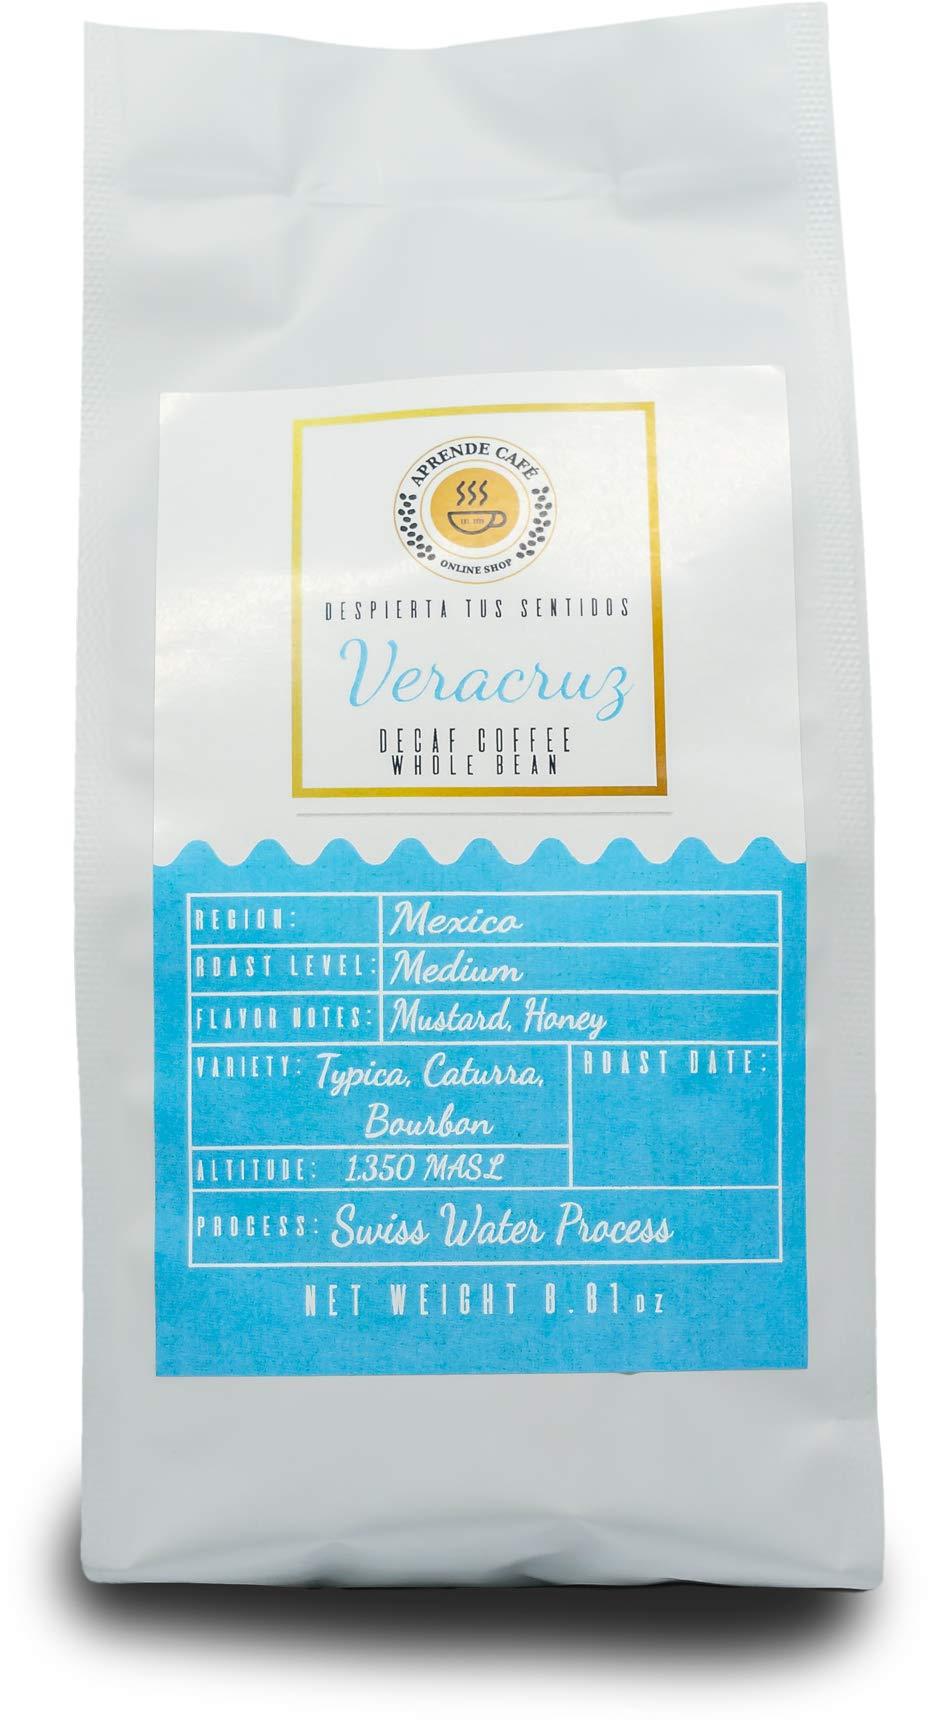 Veracruz Swiss water Process Decaf coffee. Whole Beans. Aprende cafe. (8.81 oz)